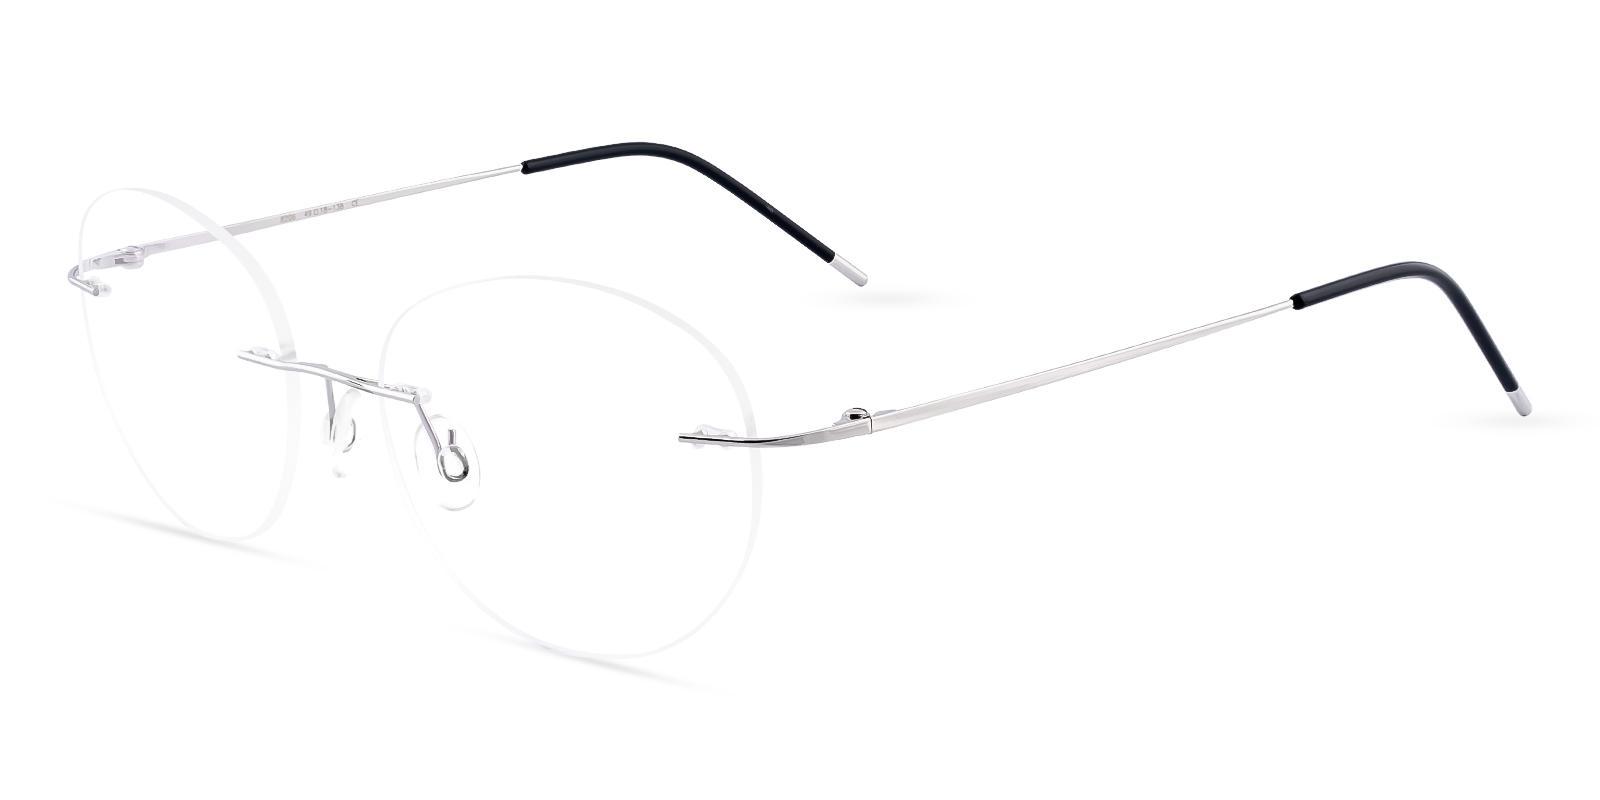 Terrace Park Silver Metal Eyeglasses , NosePads Frames from ABBE Glasses